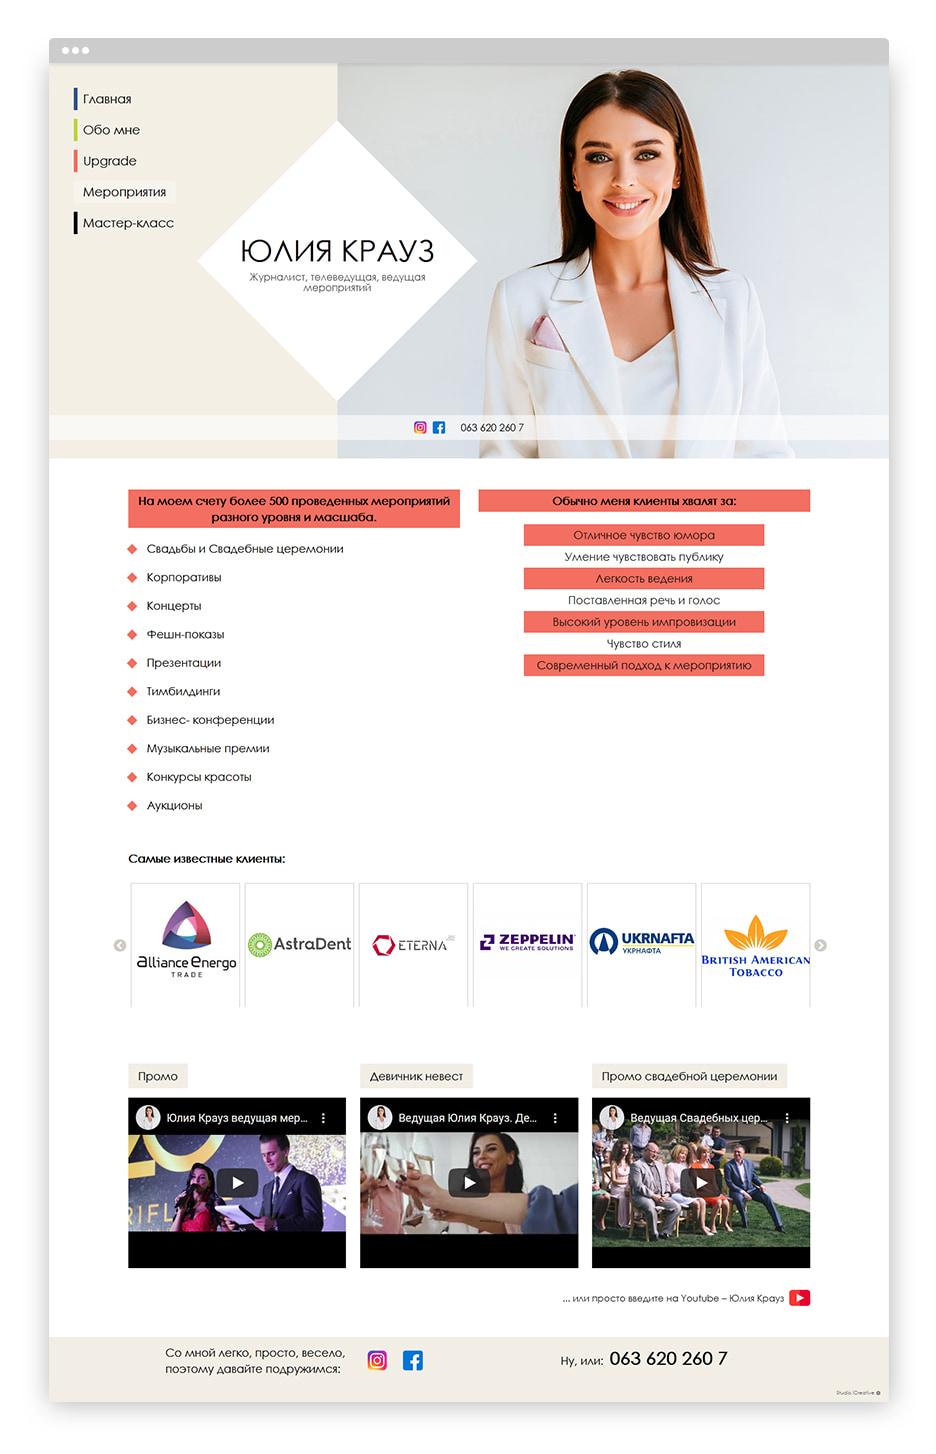 icreative.com.ua_krauz_portfolio_2